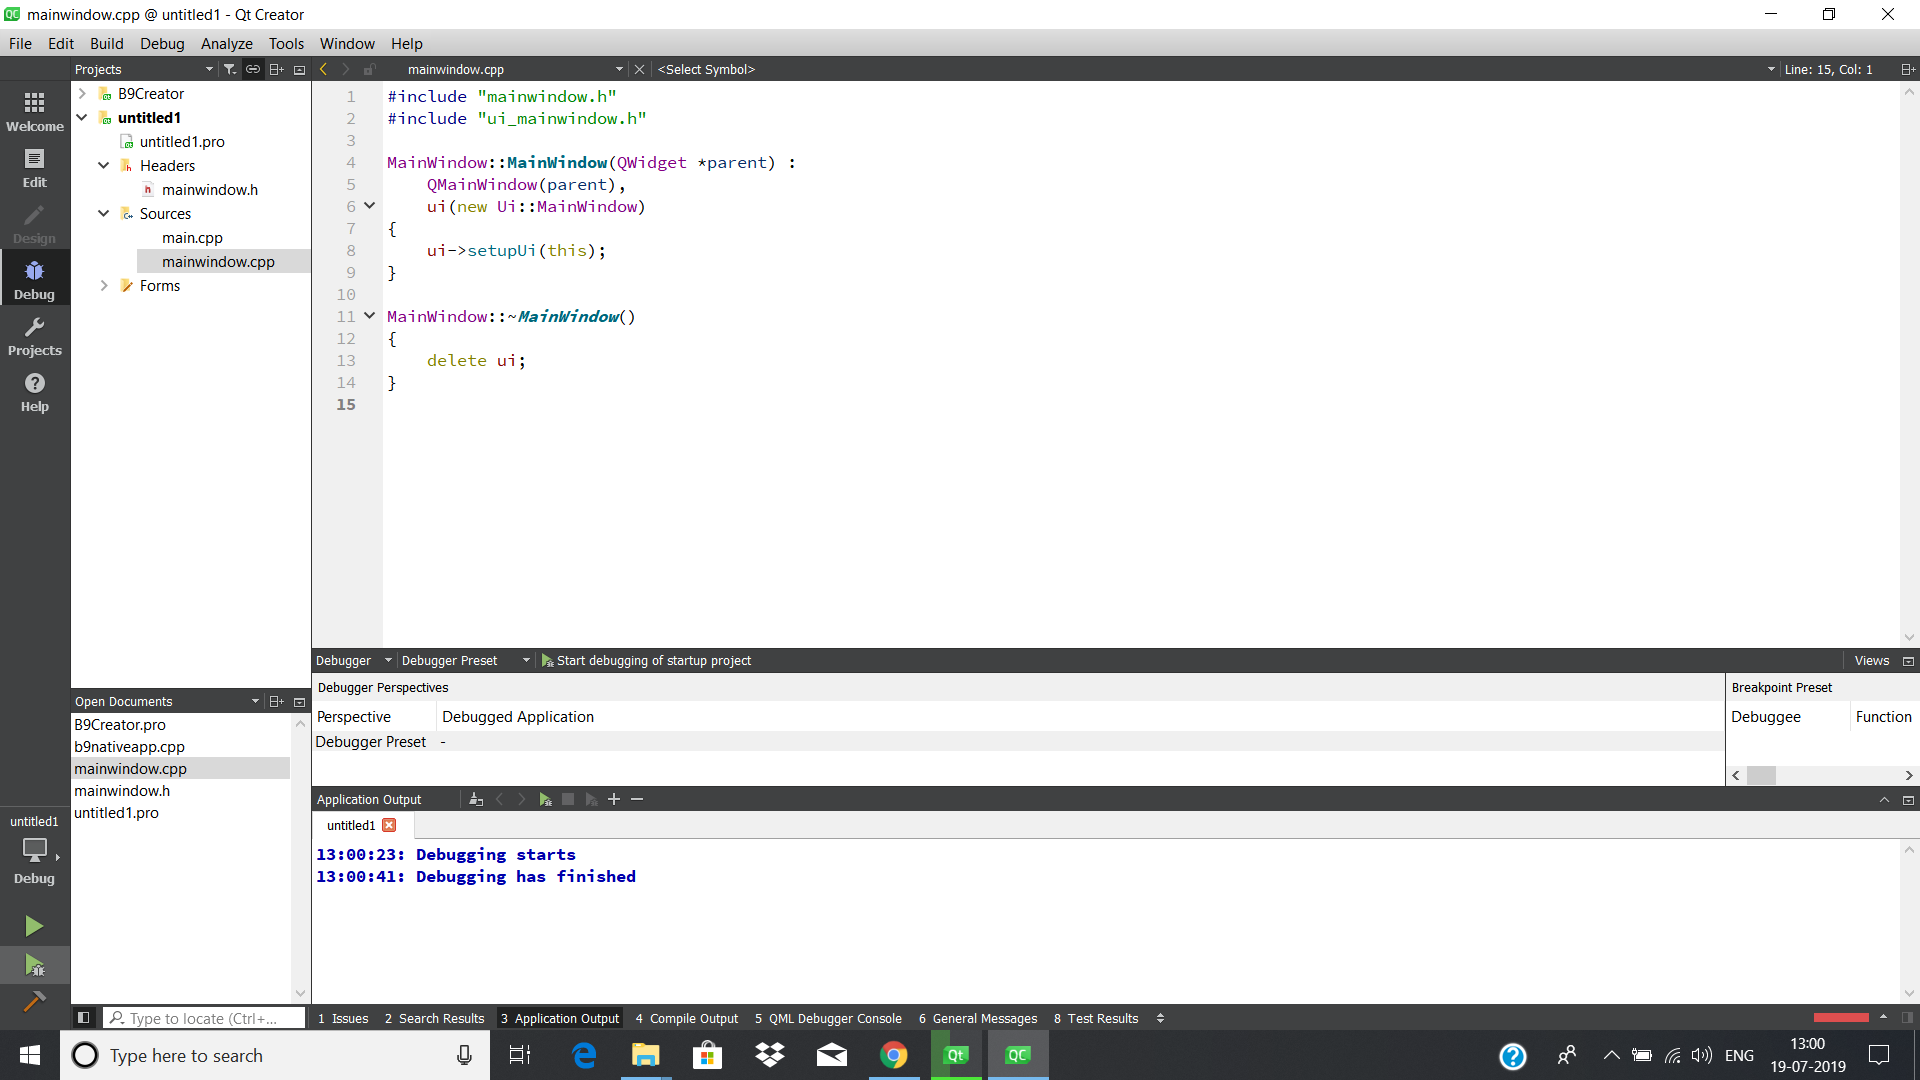 0_1563521457275_Screenshot (2).png